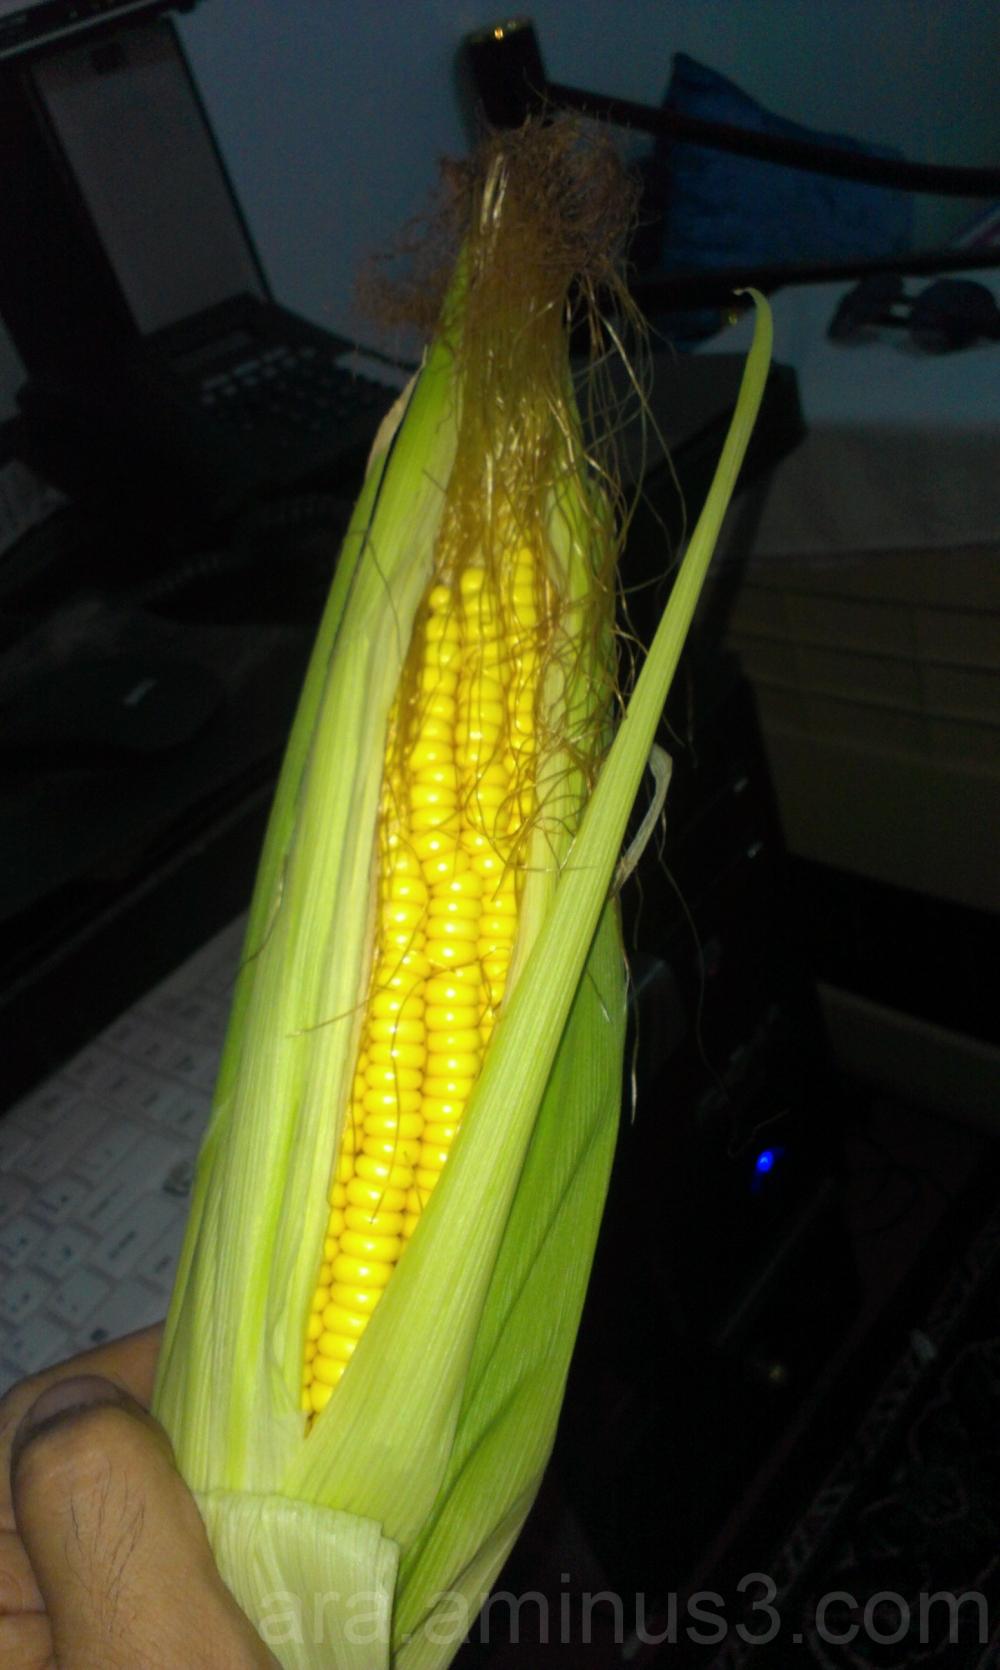 nice corn !